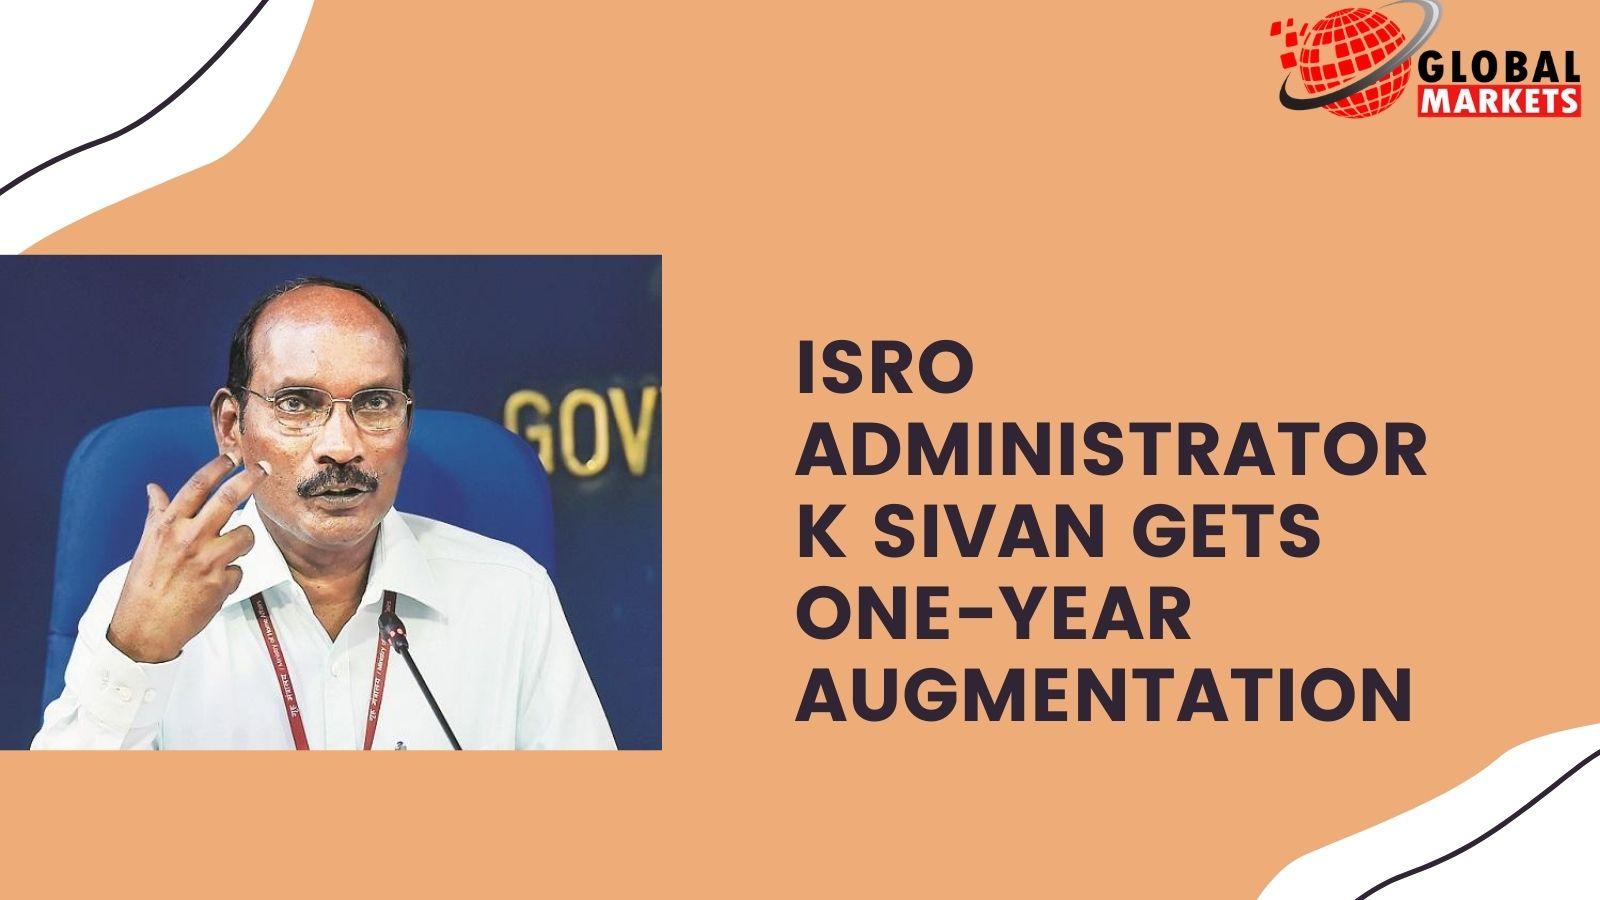 Isro administrator K Sivan gets one-year augmentation